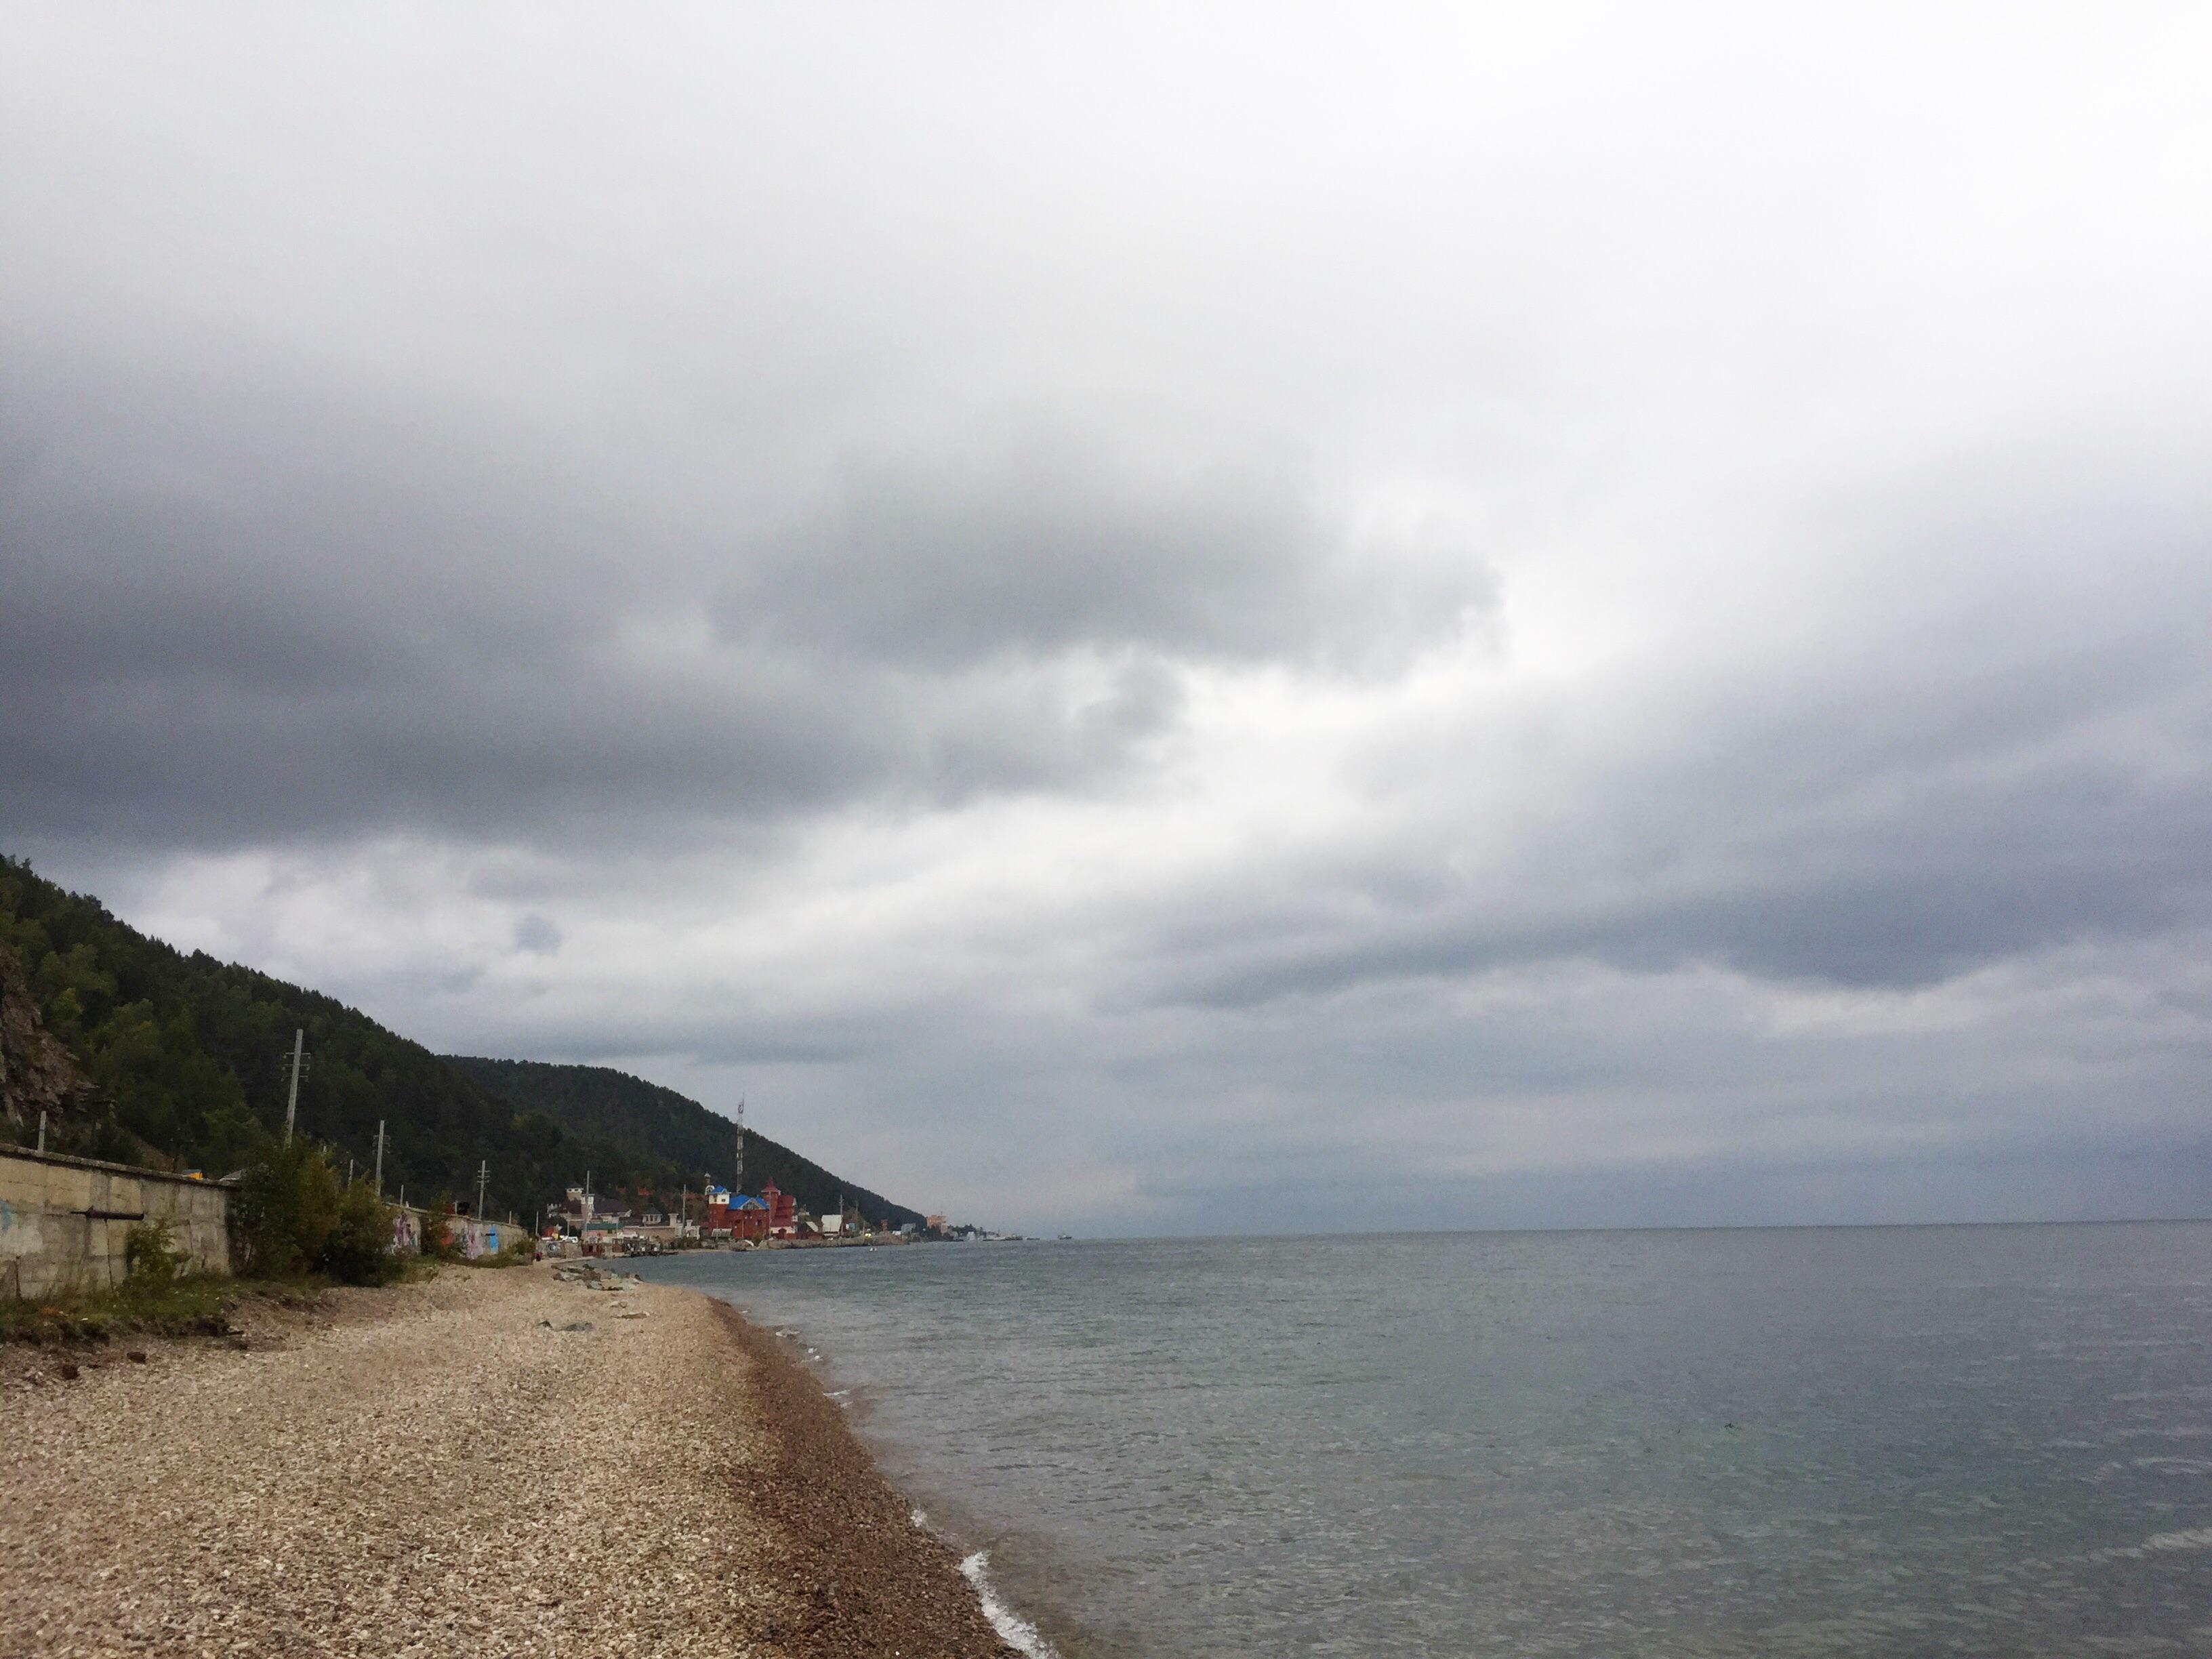 Walking along the shore.